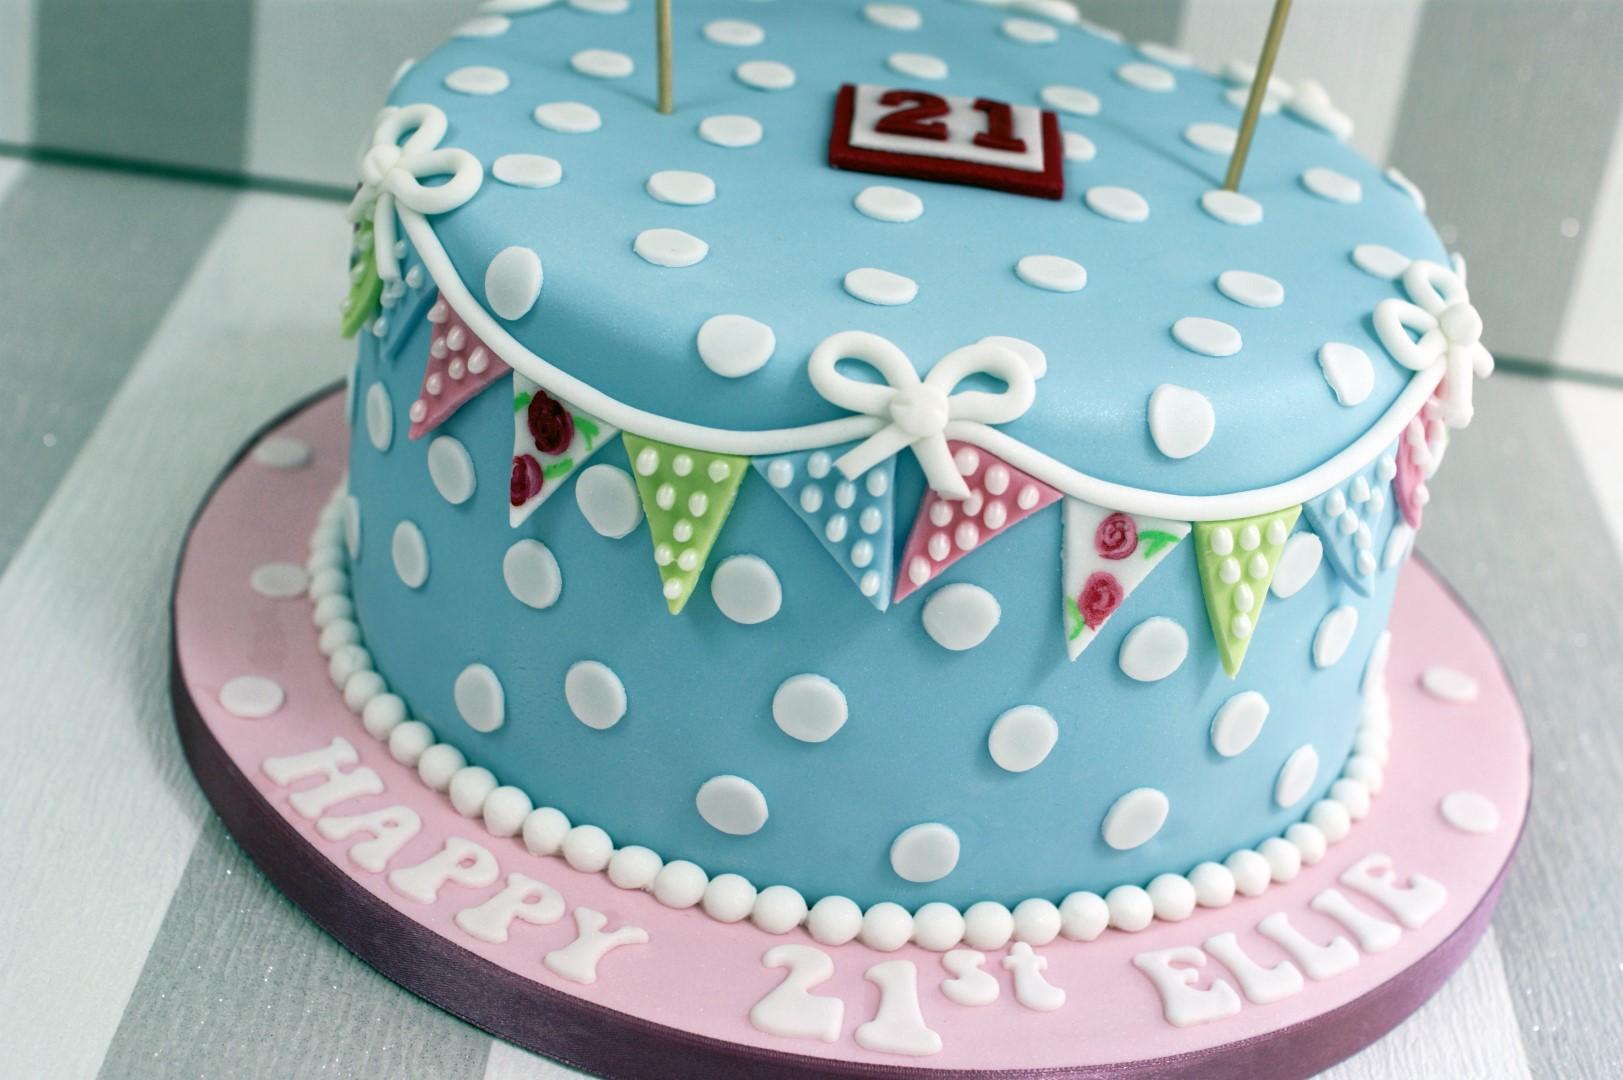 St Cake Ideas Female